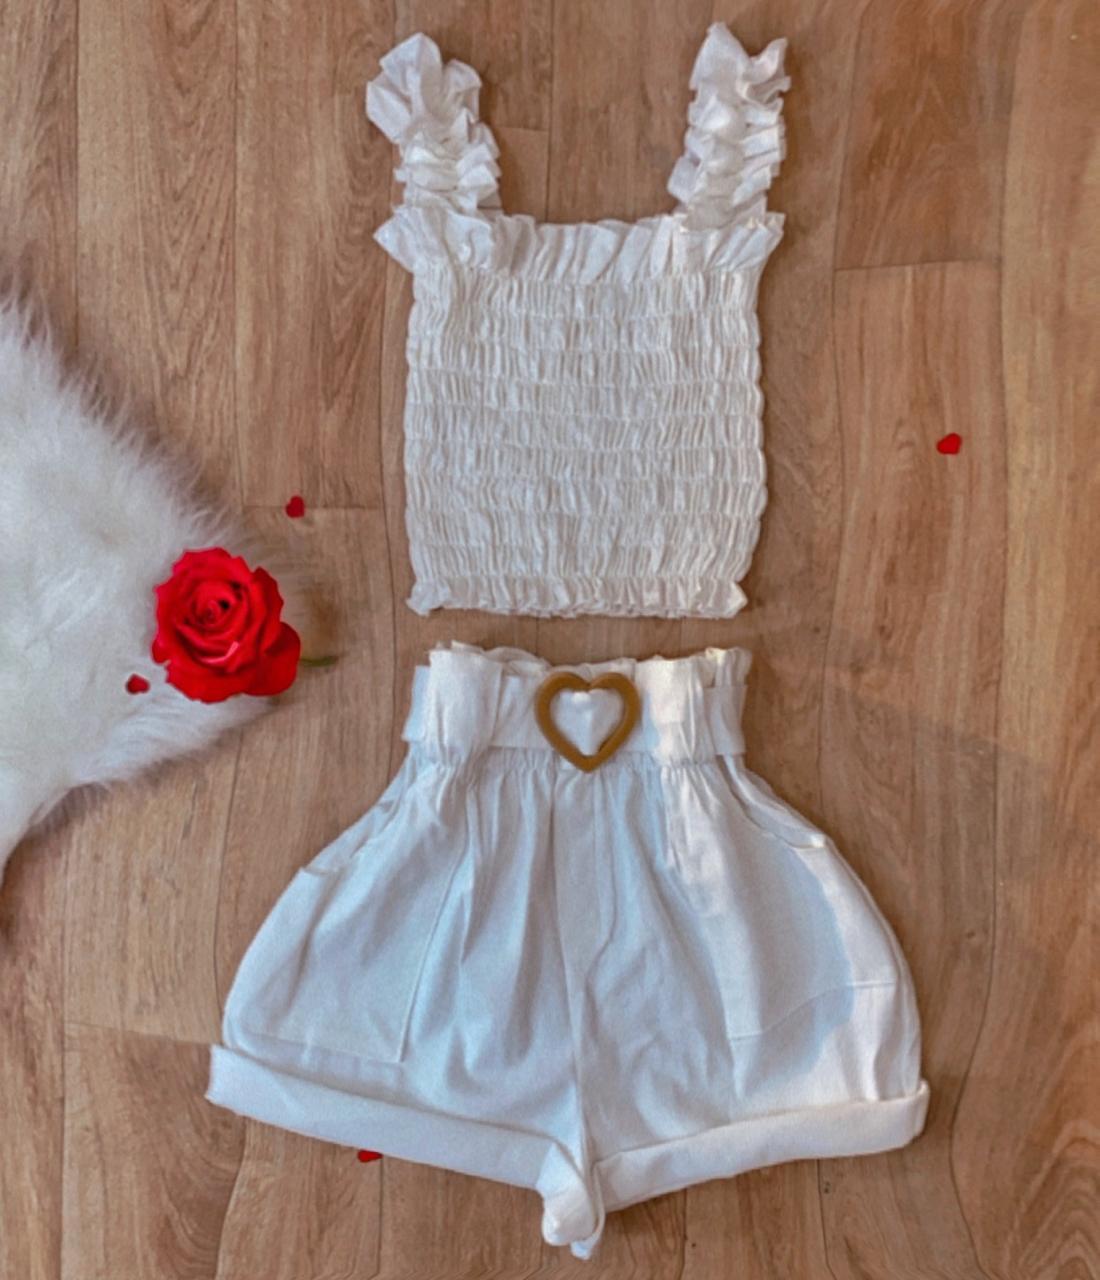 Blusa Cropped Feminino Ciganinha Lastex Manga Curta Branca